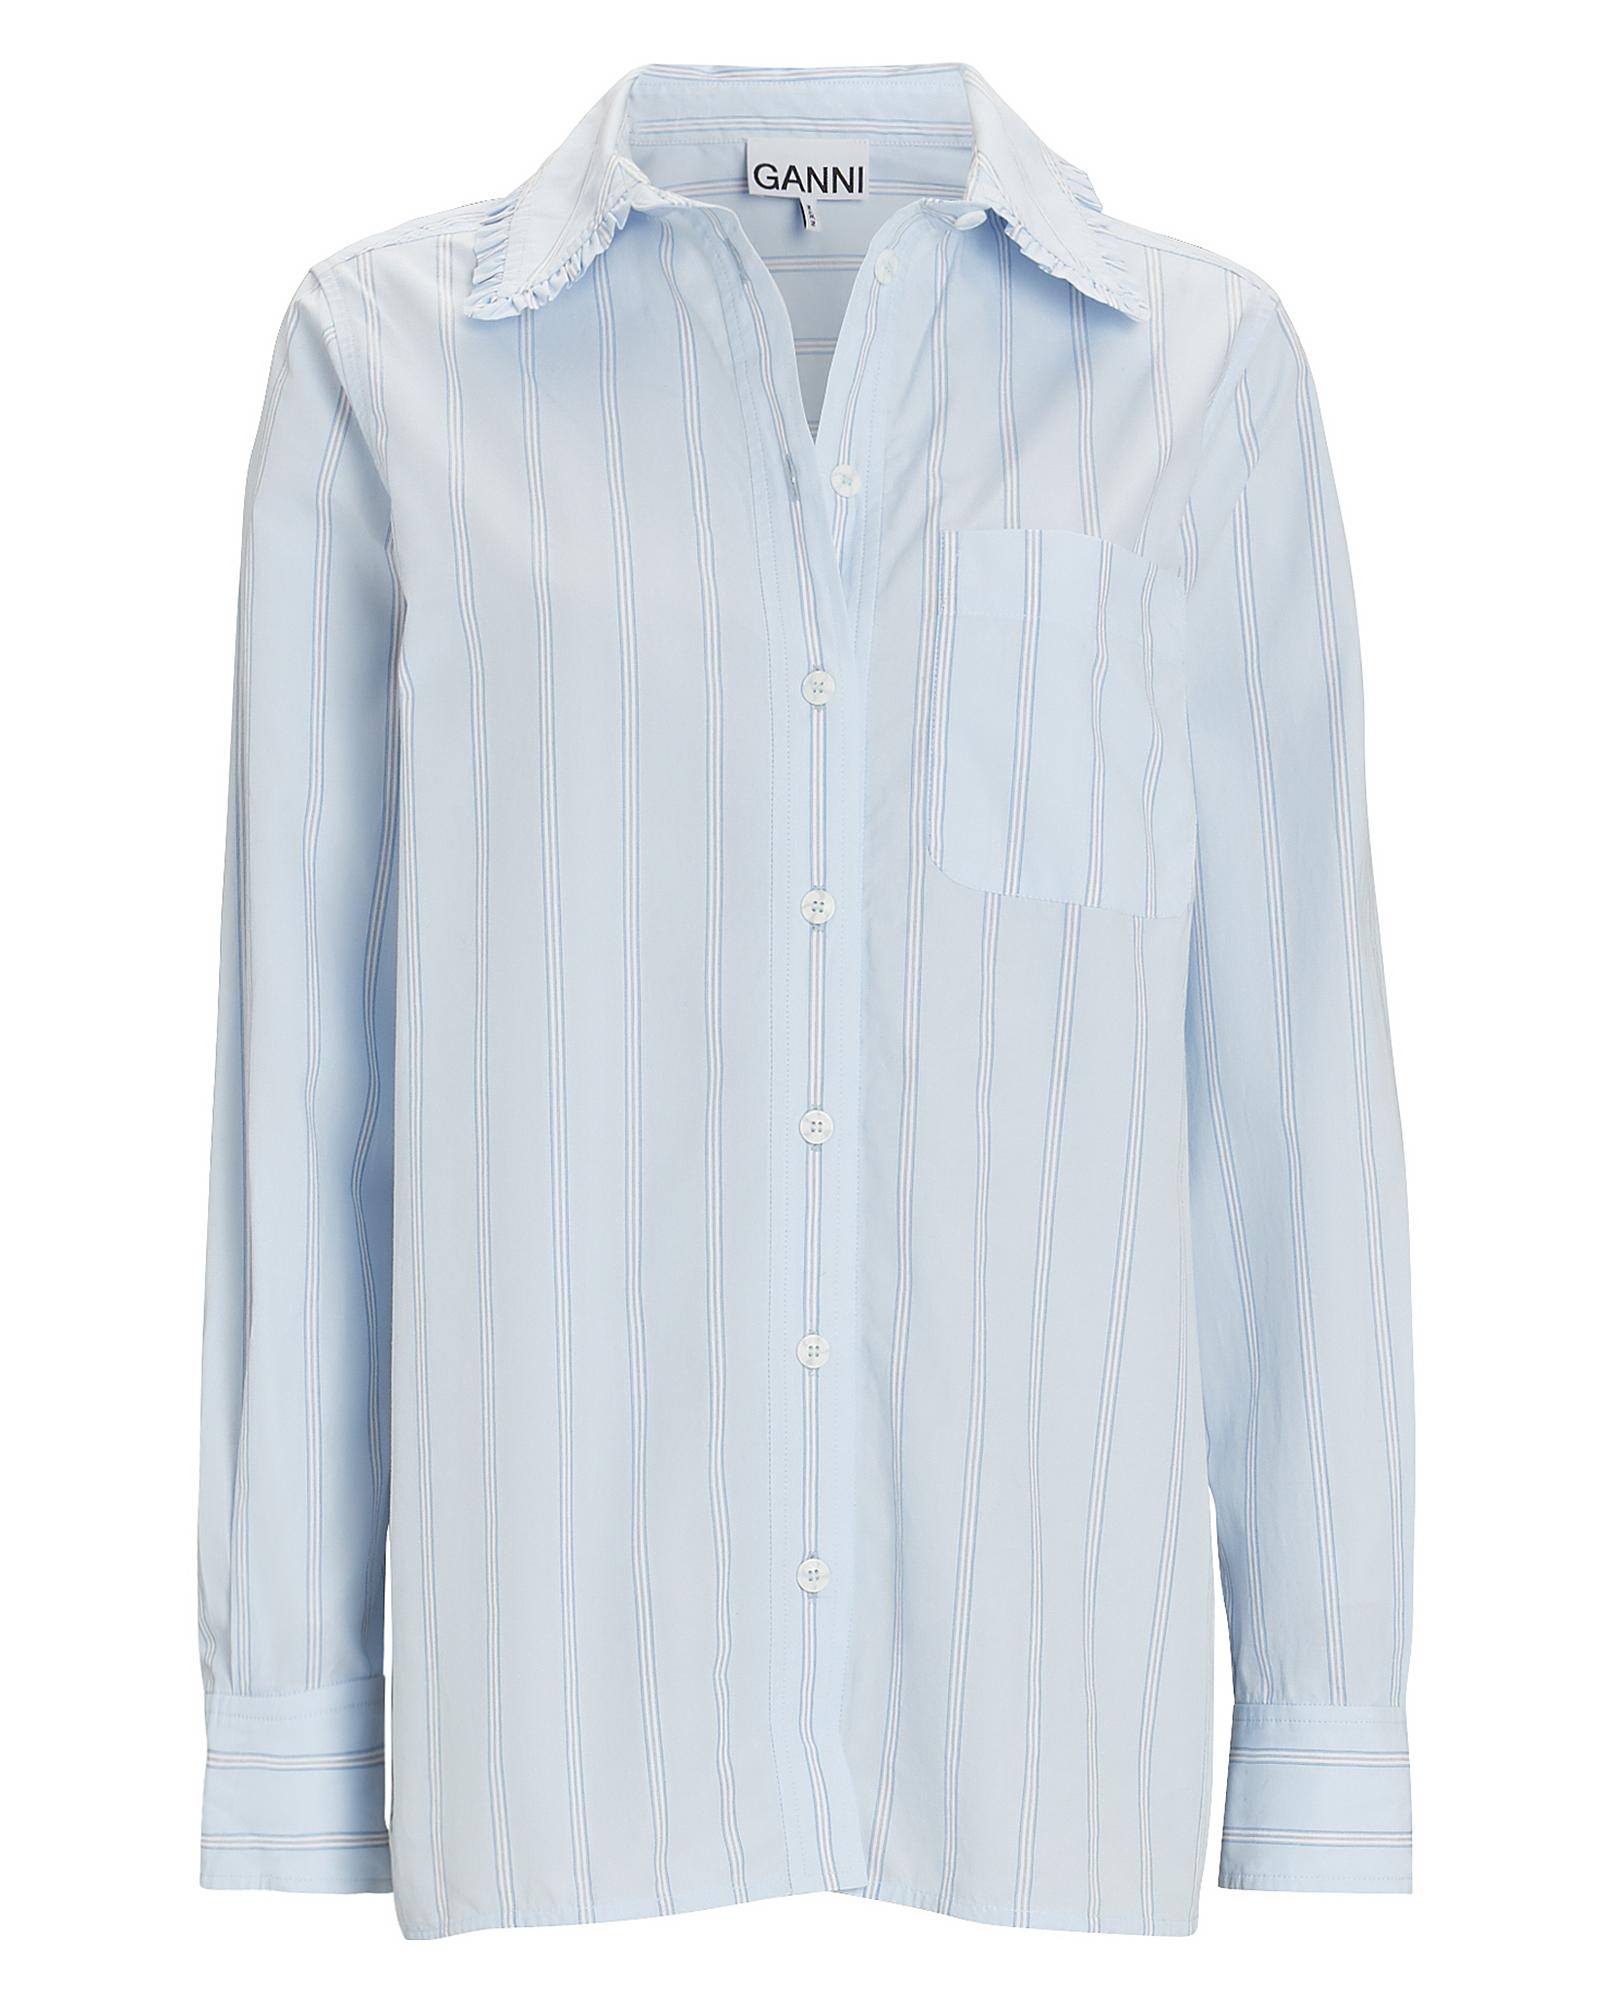 Ganni Striped Poplin Button-down Shirt In Multi